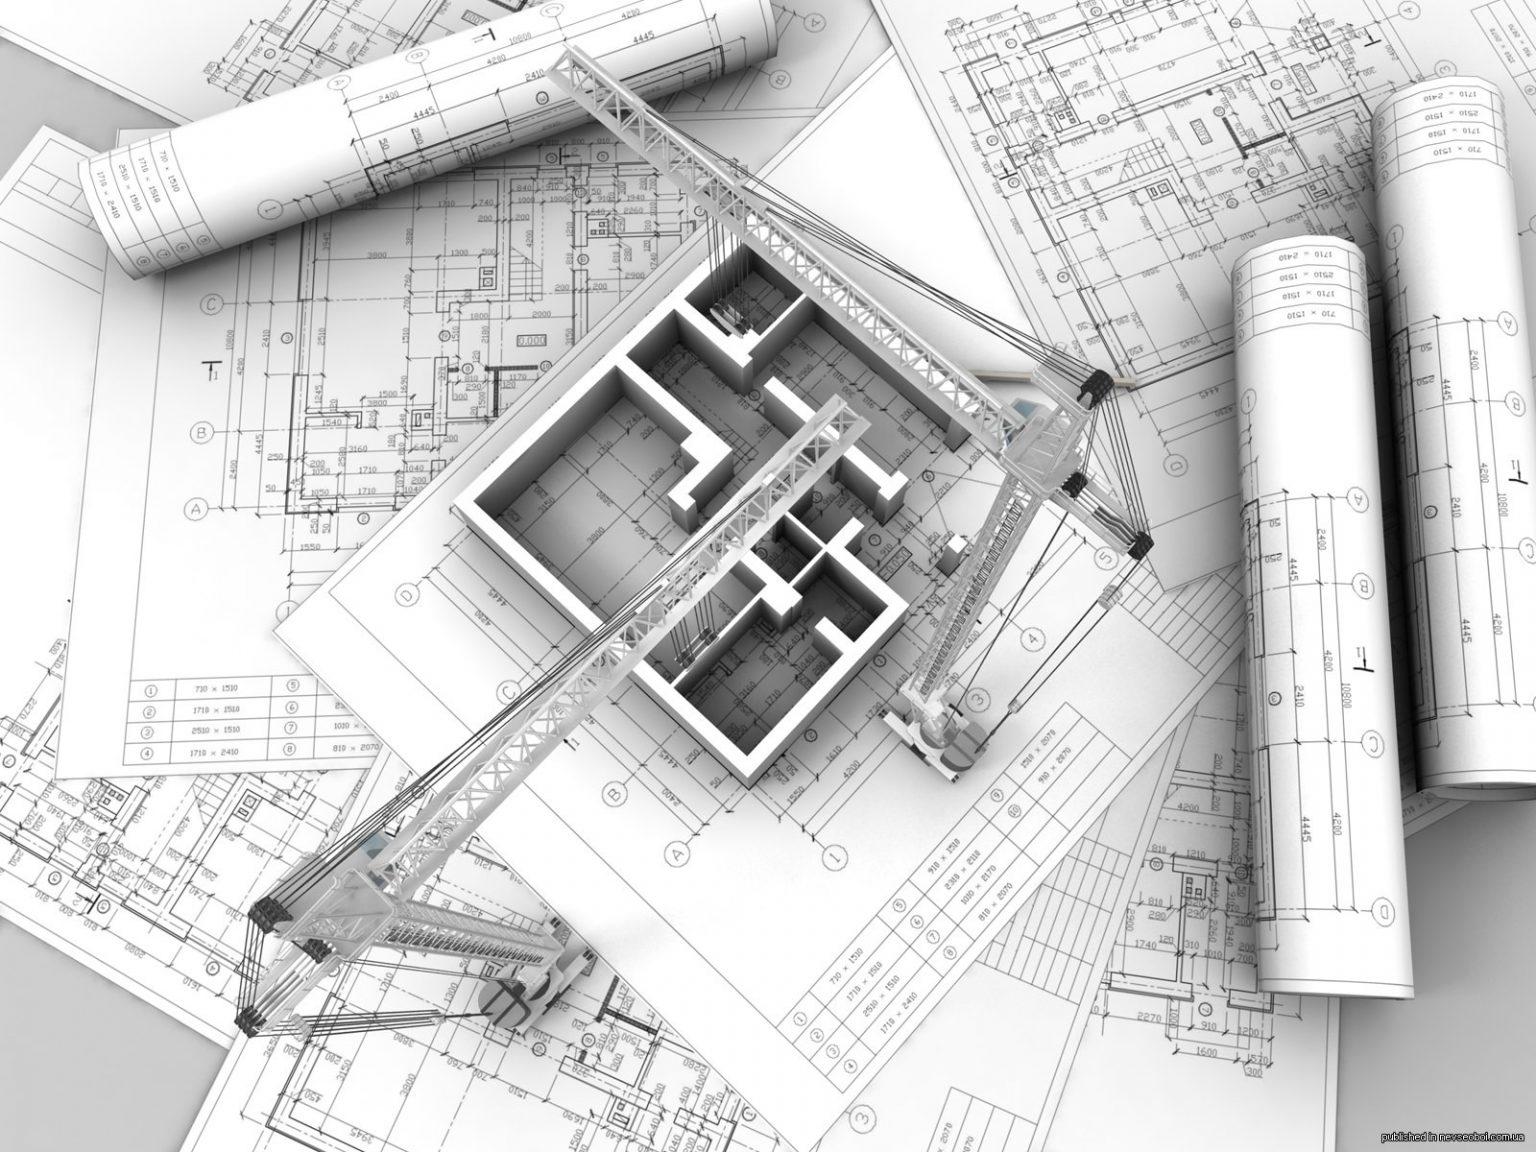 Building design image